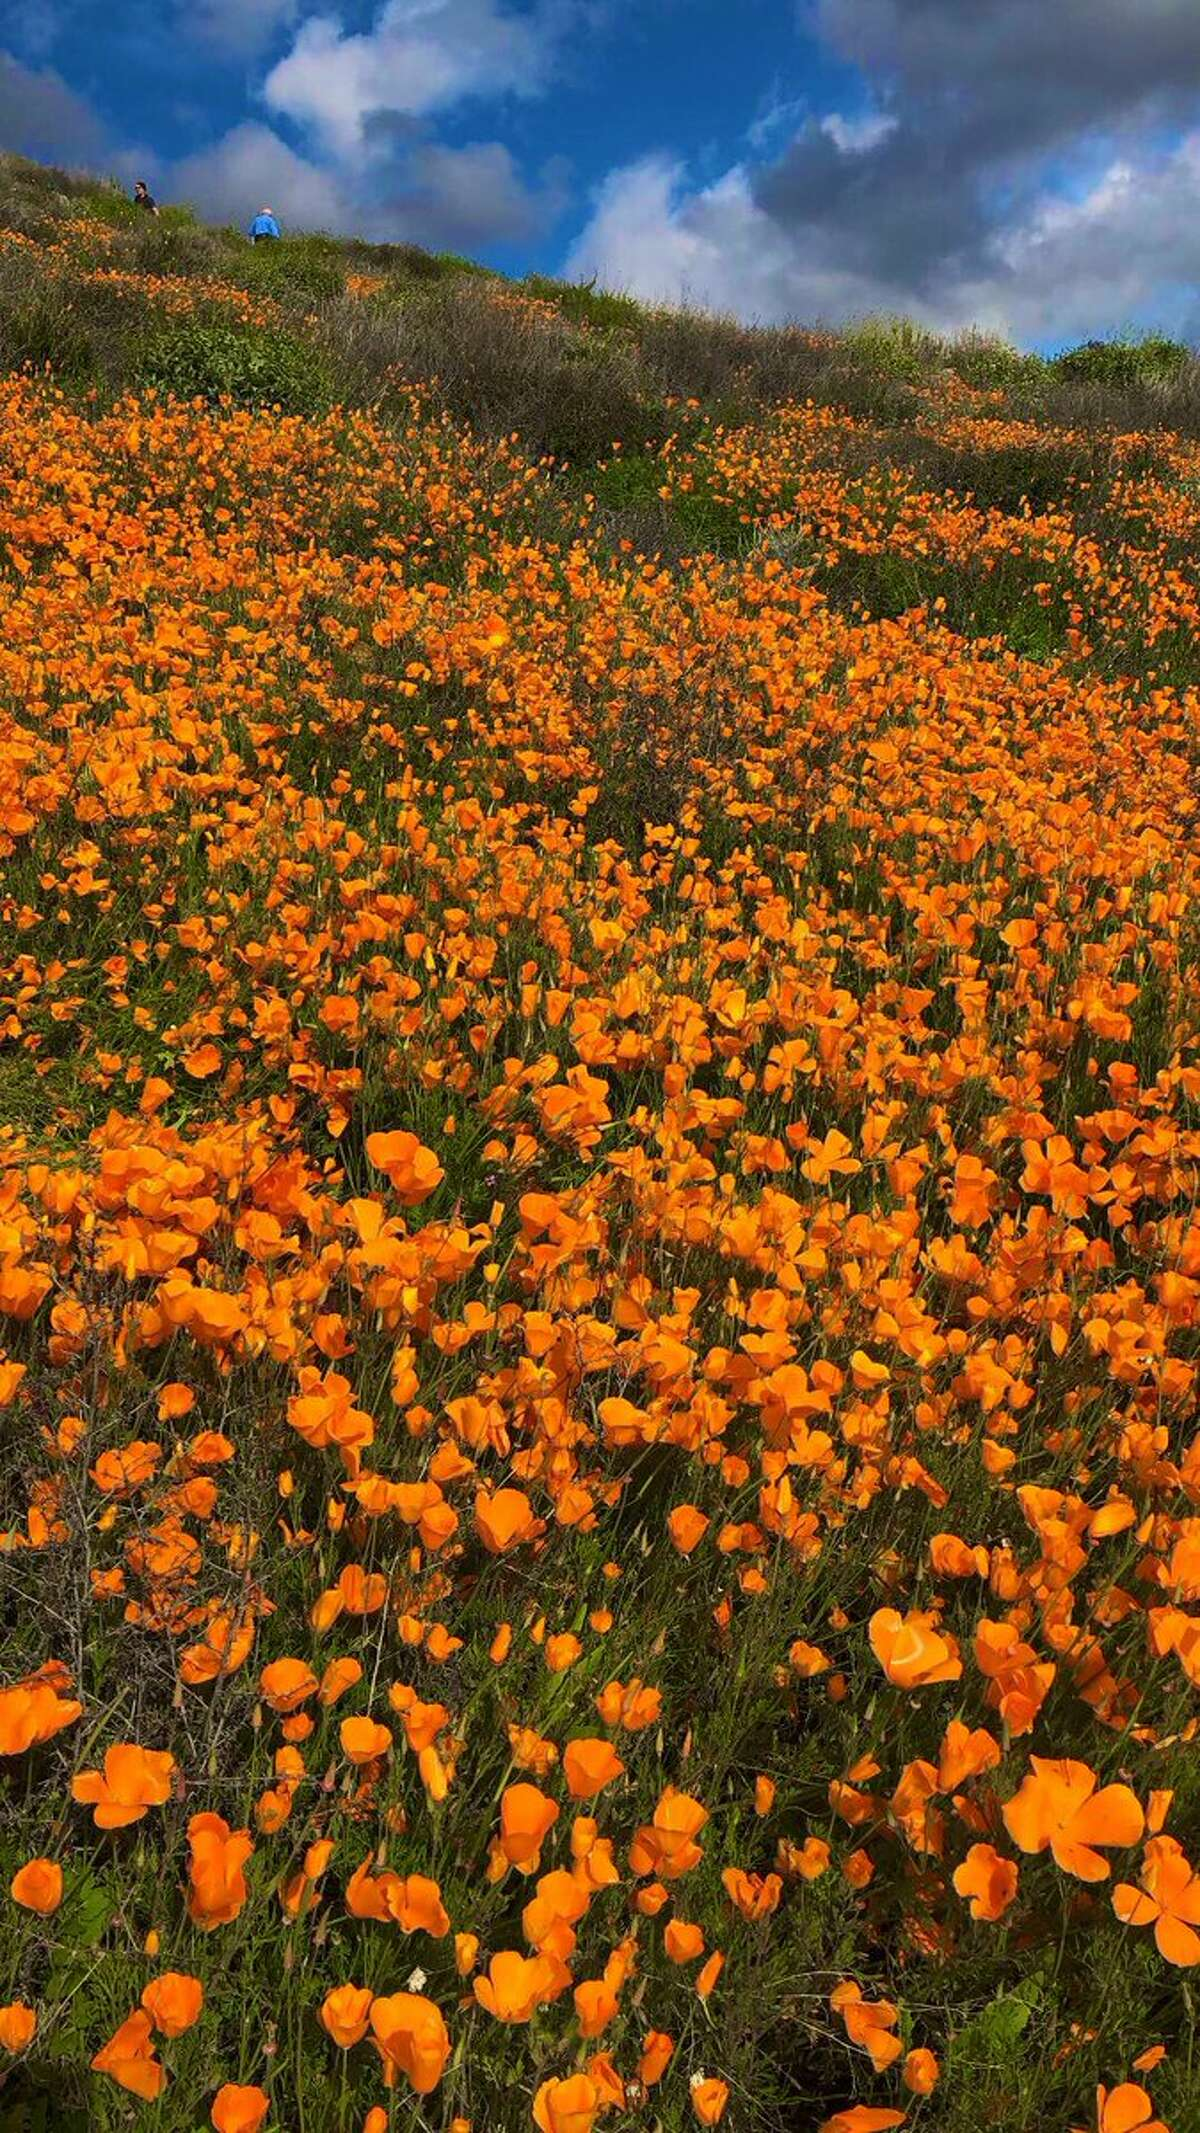 The poppy display in the Gavilan Hills near Lake Elsinore, Calif., March 2019.